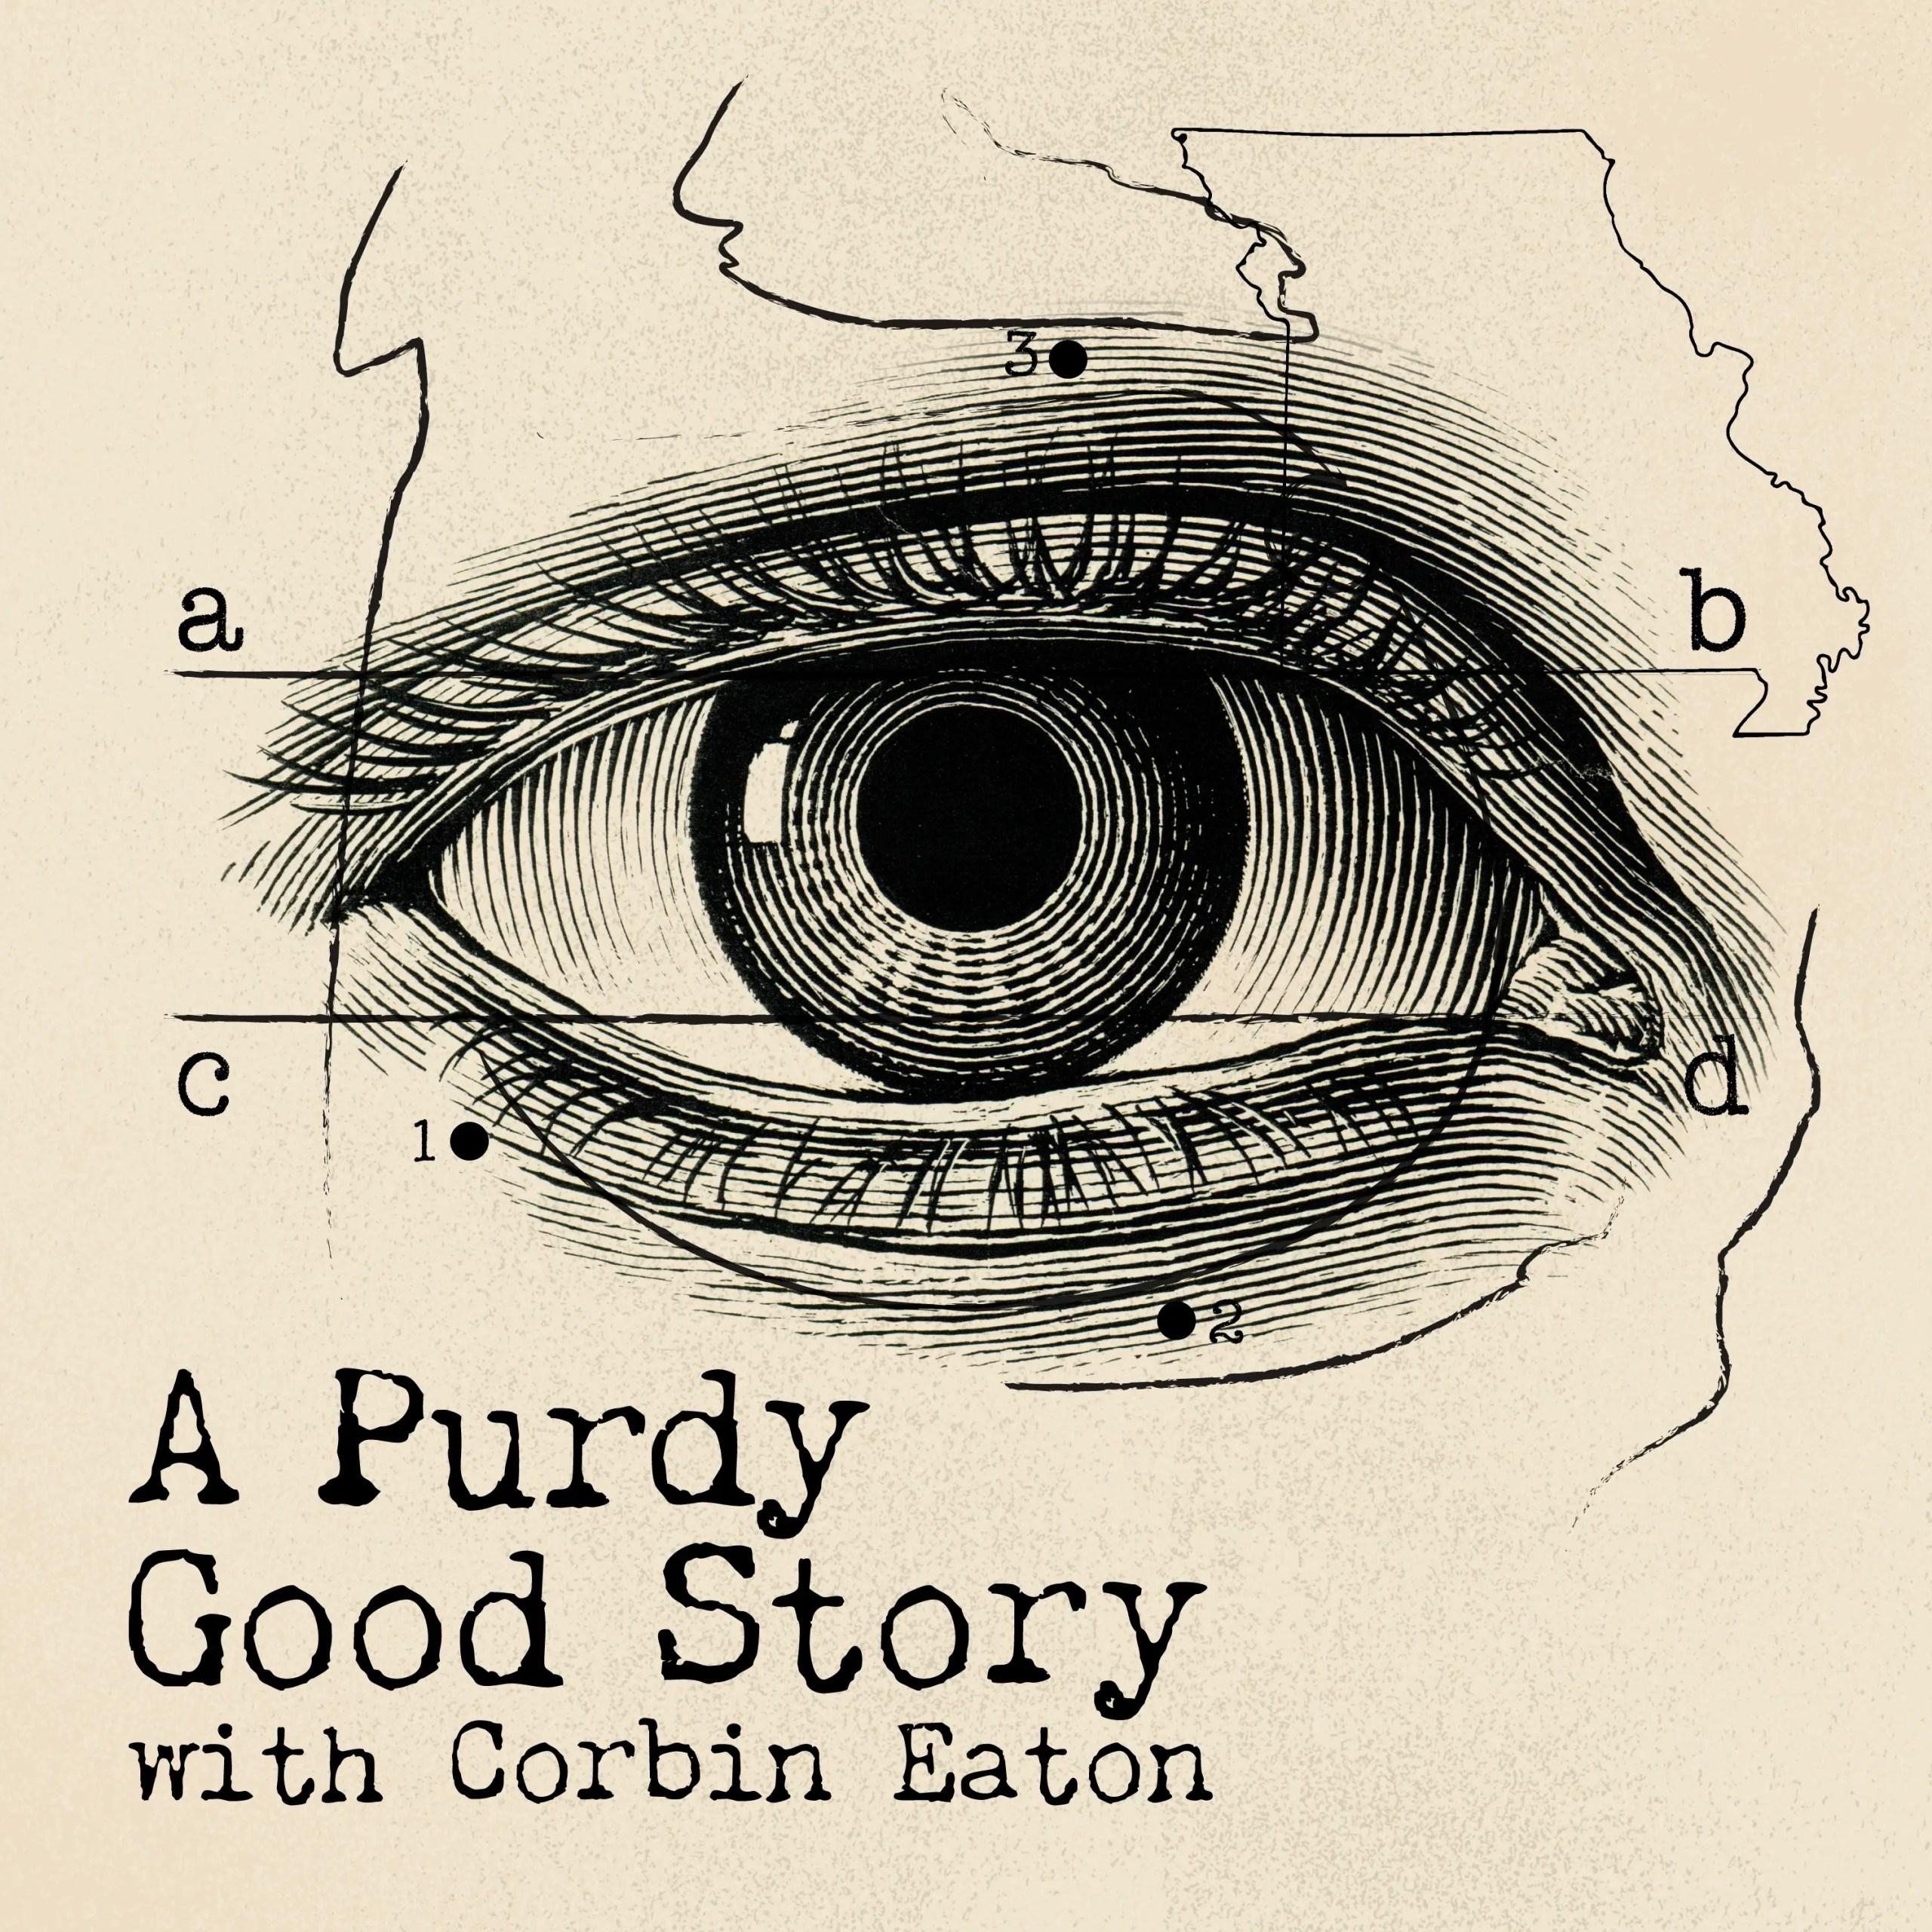 A Purdy Good Story with Corbin Eaton - Logo